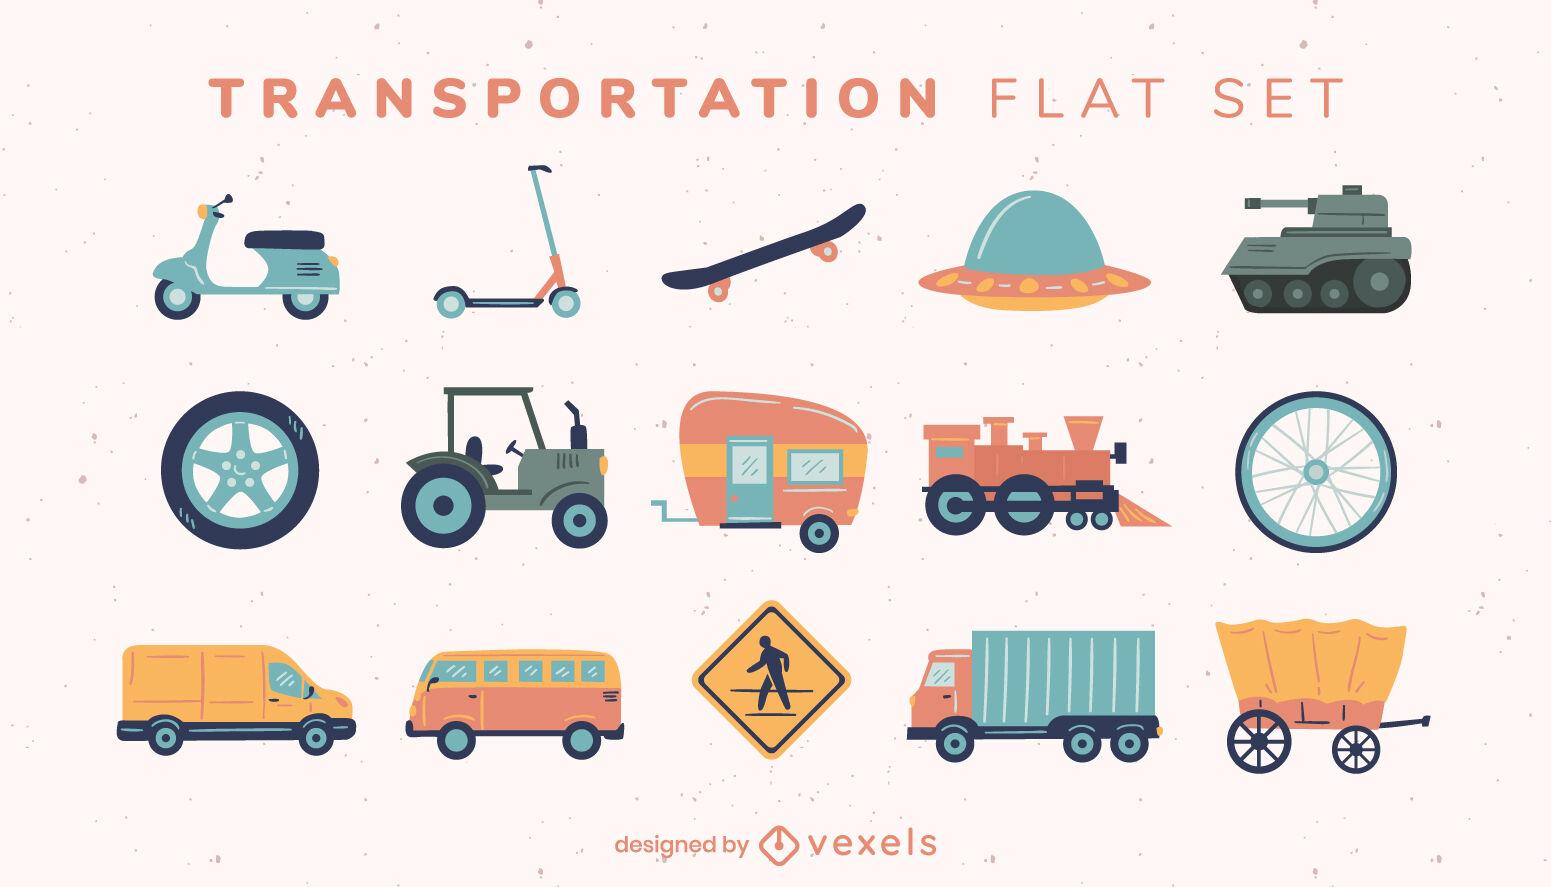 Transport items flat set